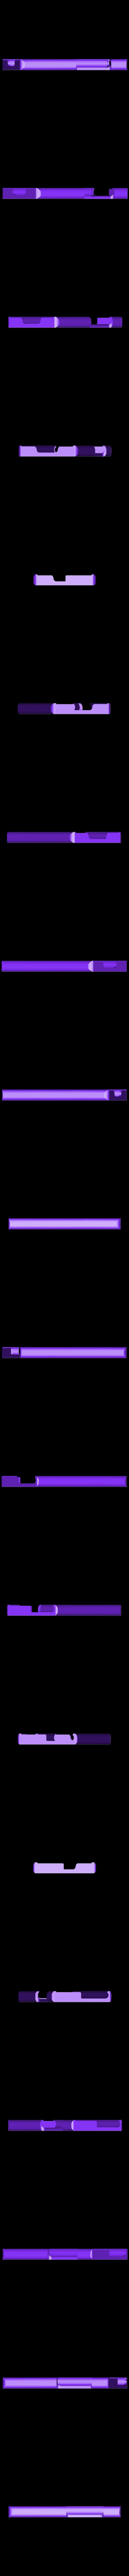 N9case_block_with_Nokia_version_3.stl Download free STL file Nokia N9 case • Design to 3D print, AlbertKhan3D